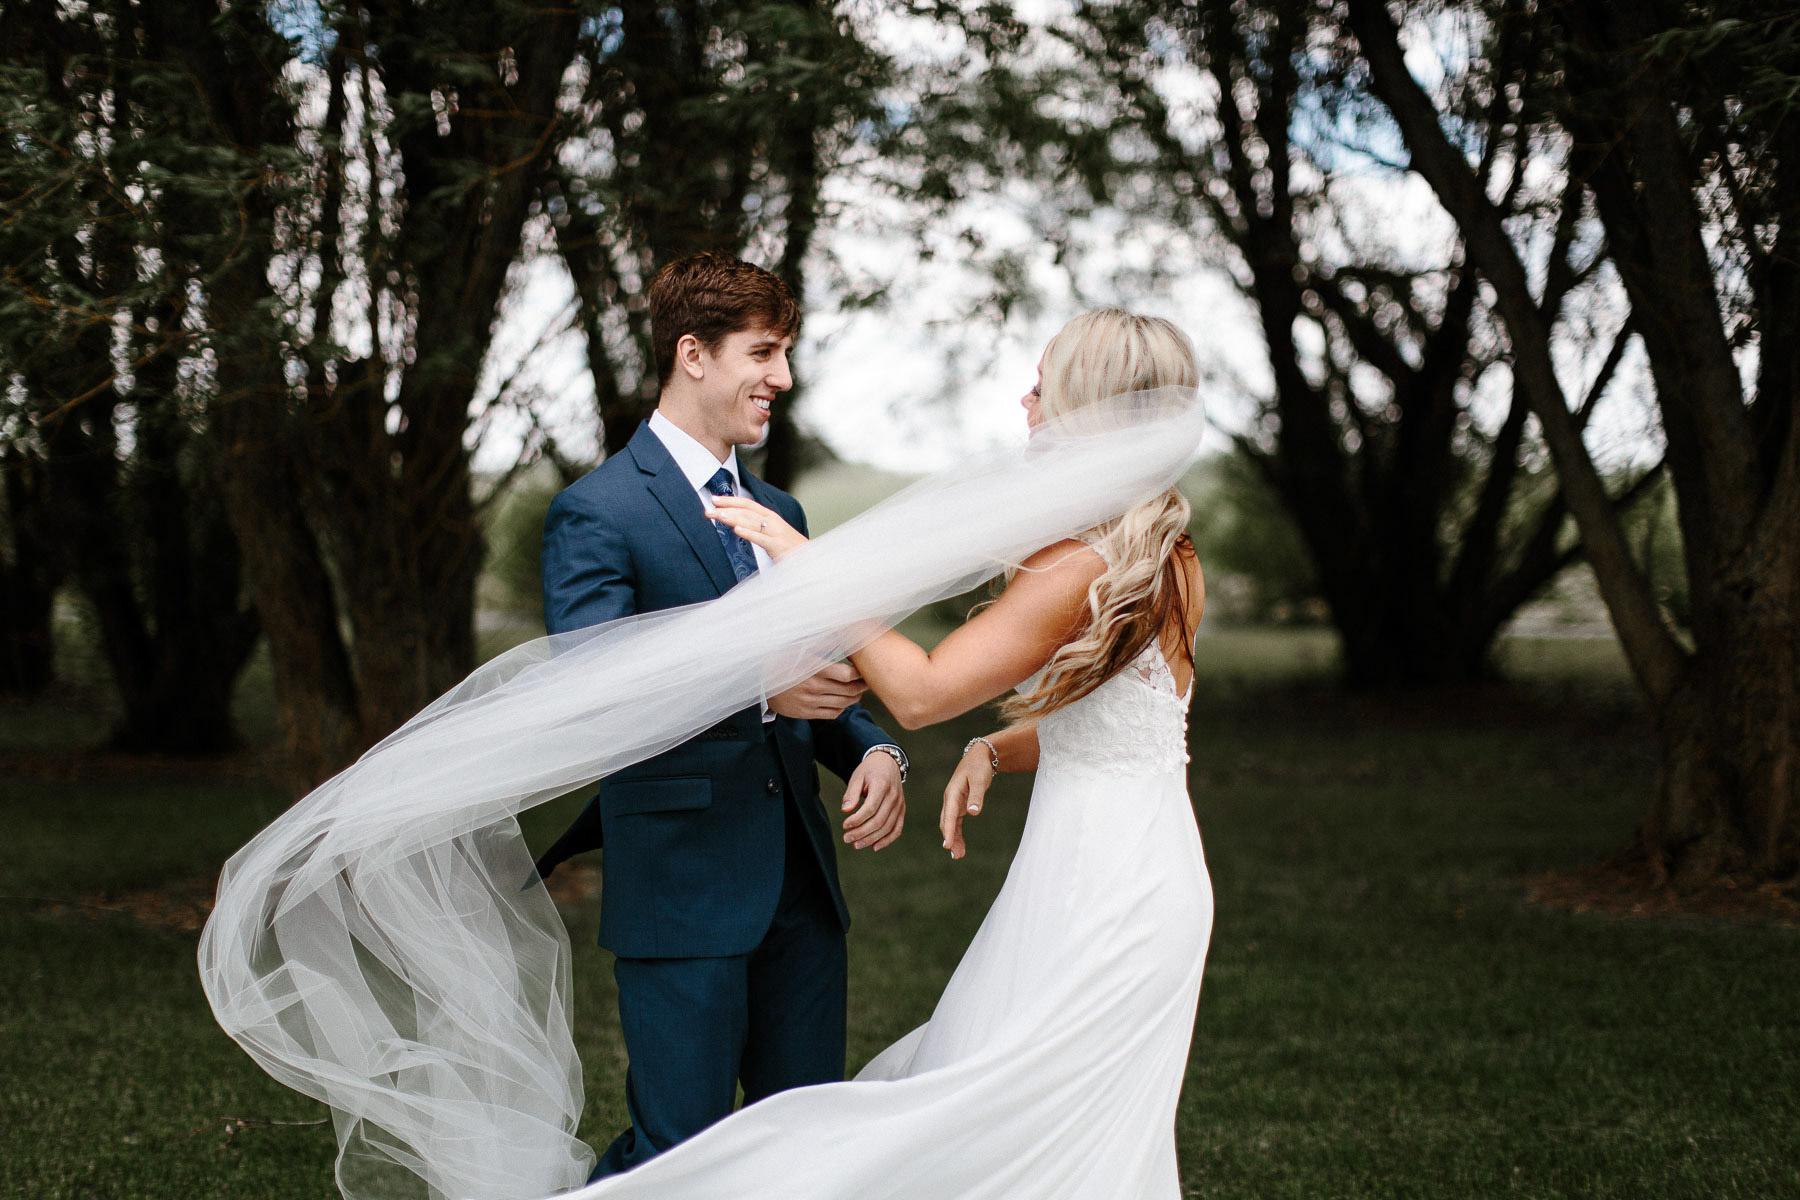 Intimate_Farmhouse_SD_Wedding_Bridgette_Philip_025.jpg